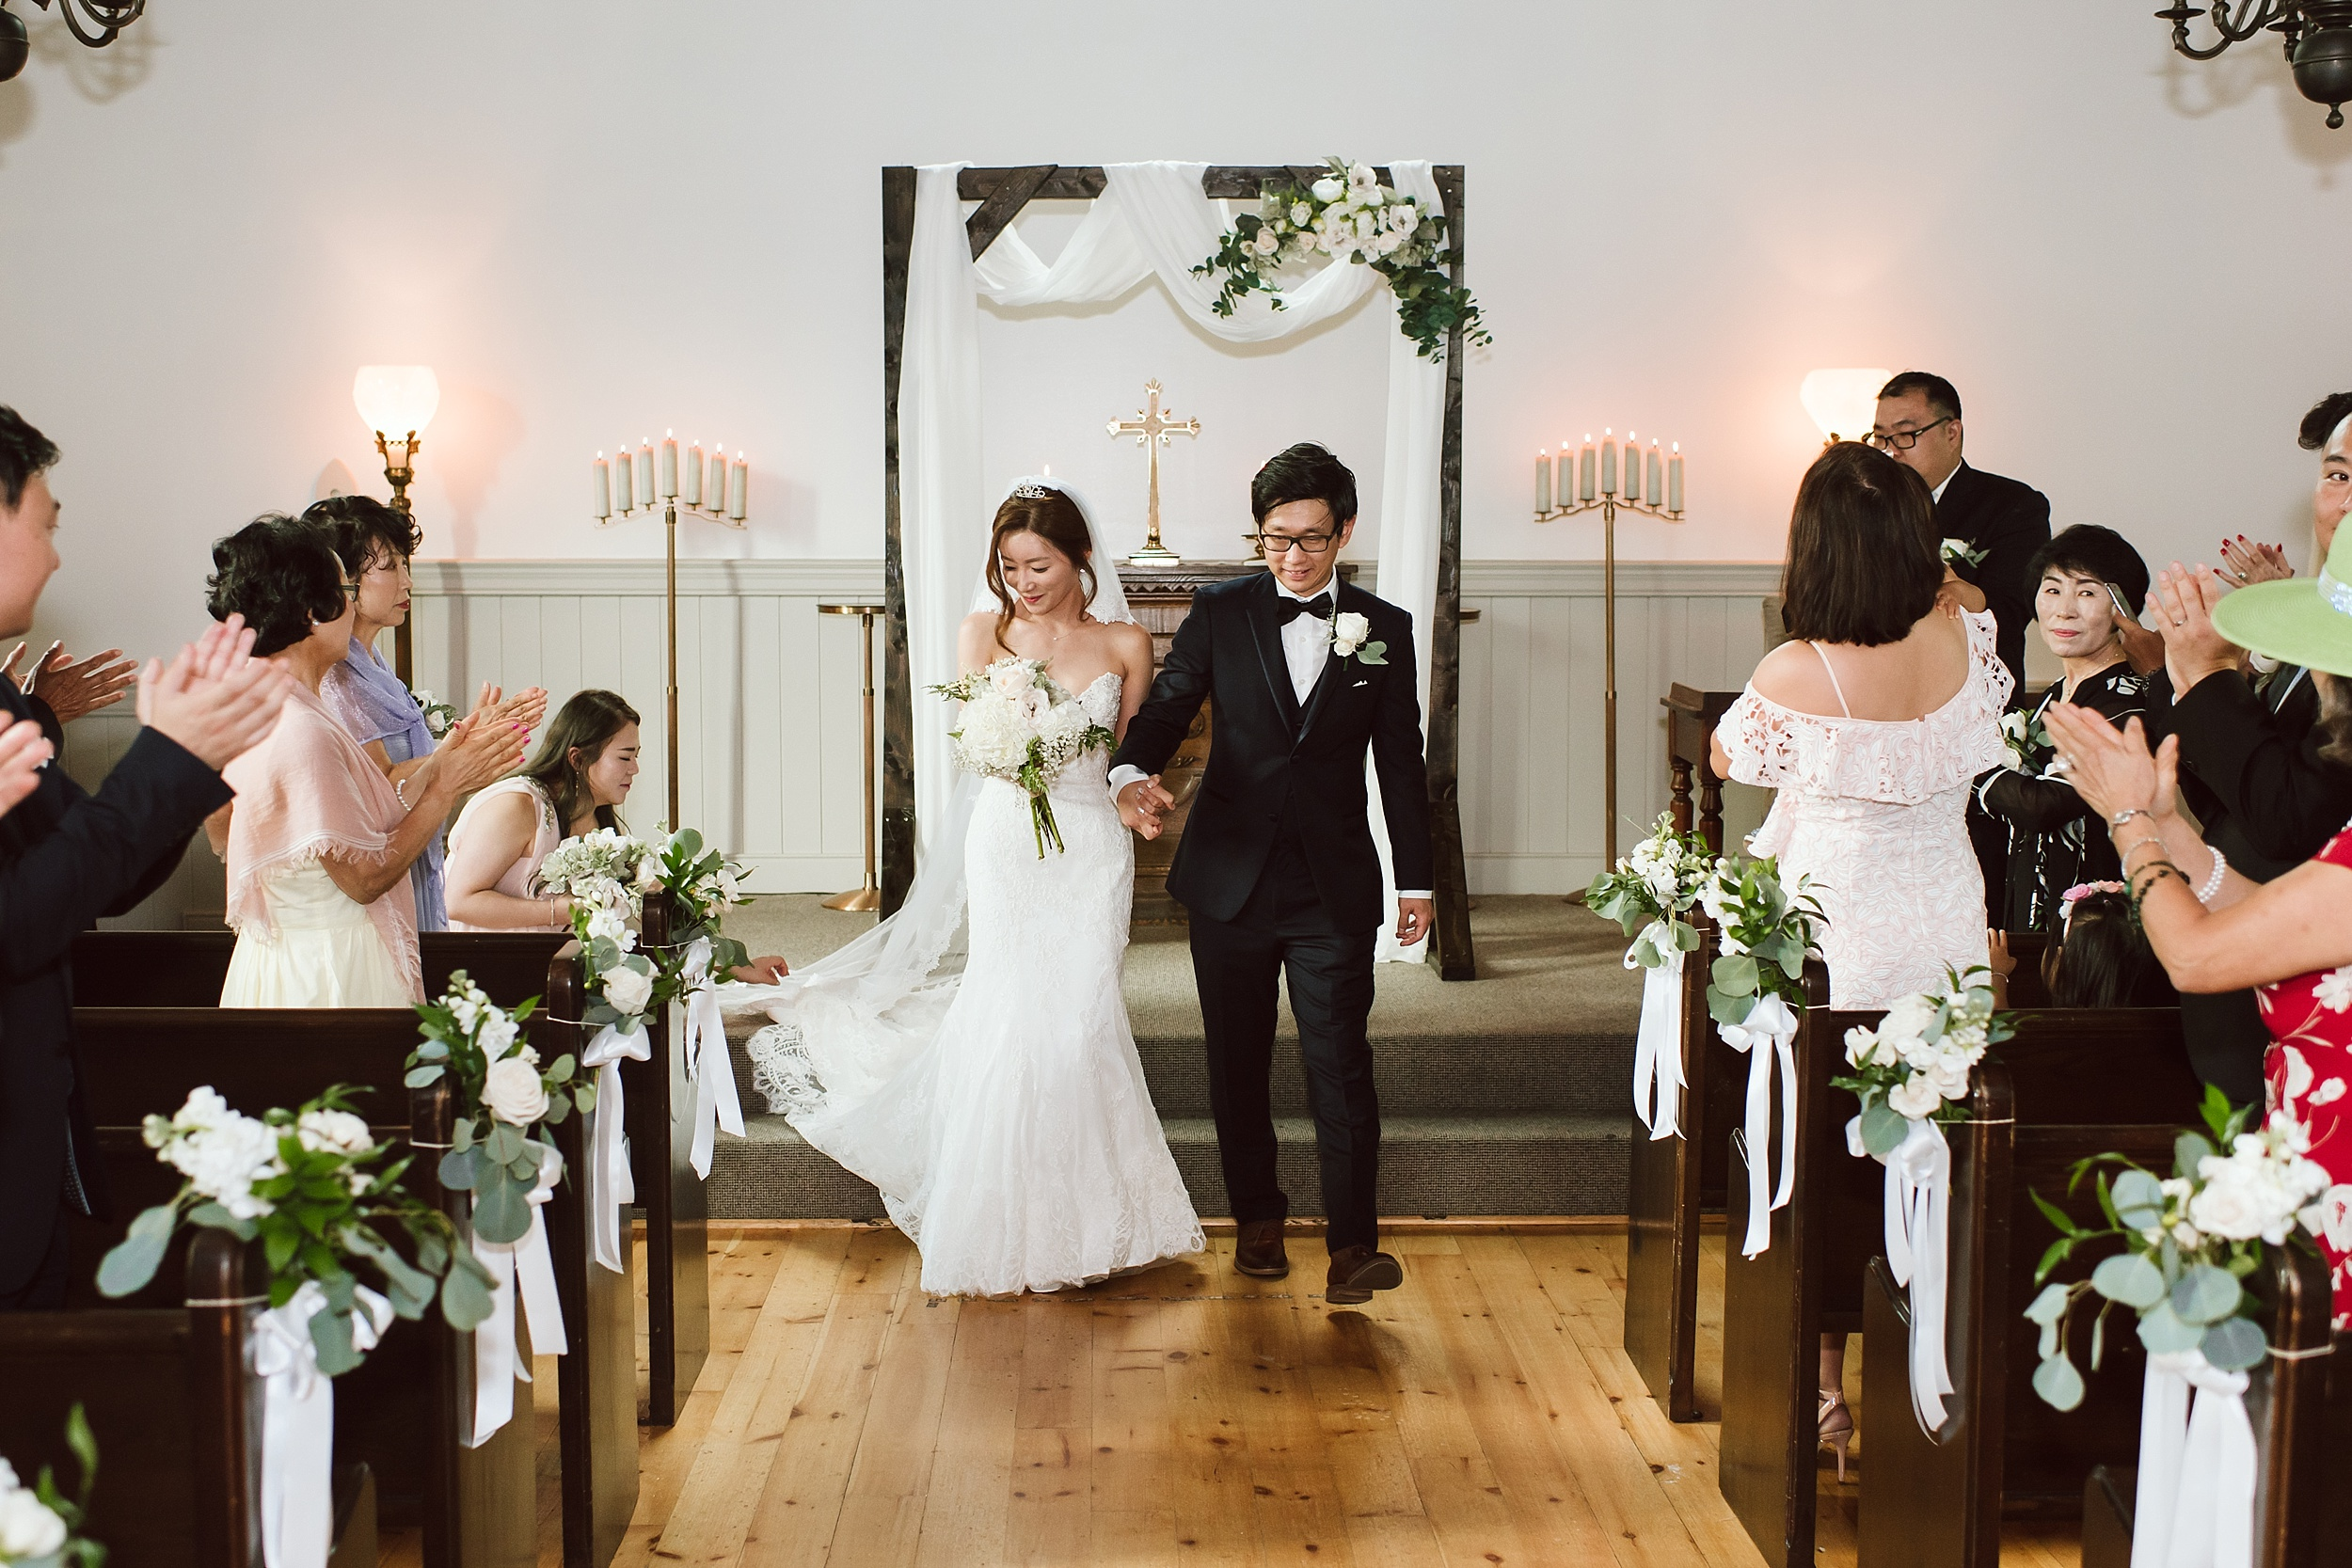 Doctors_House_Kleinburg_Wedding_Toronto_Photographer_0028.jpg